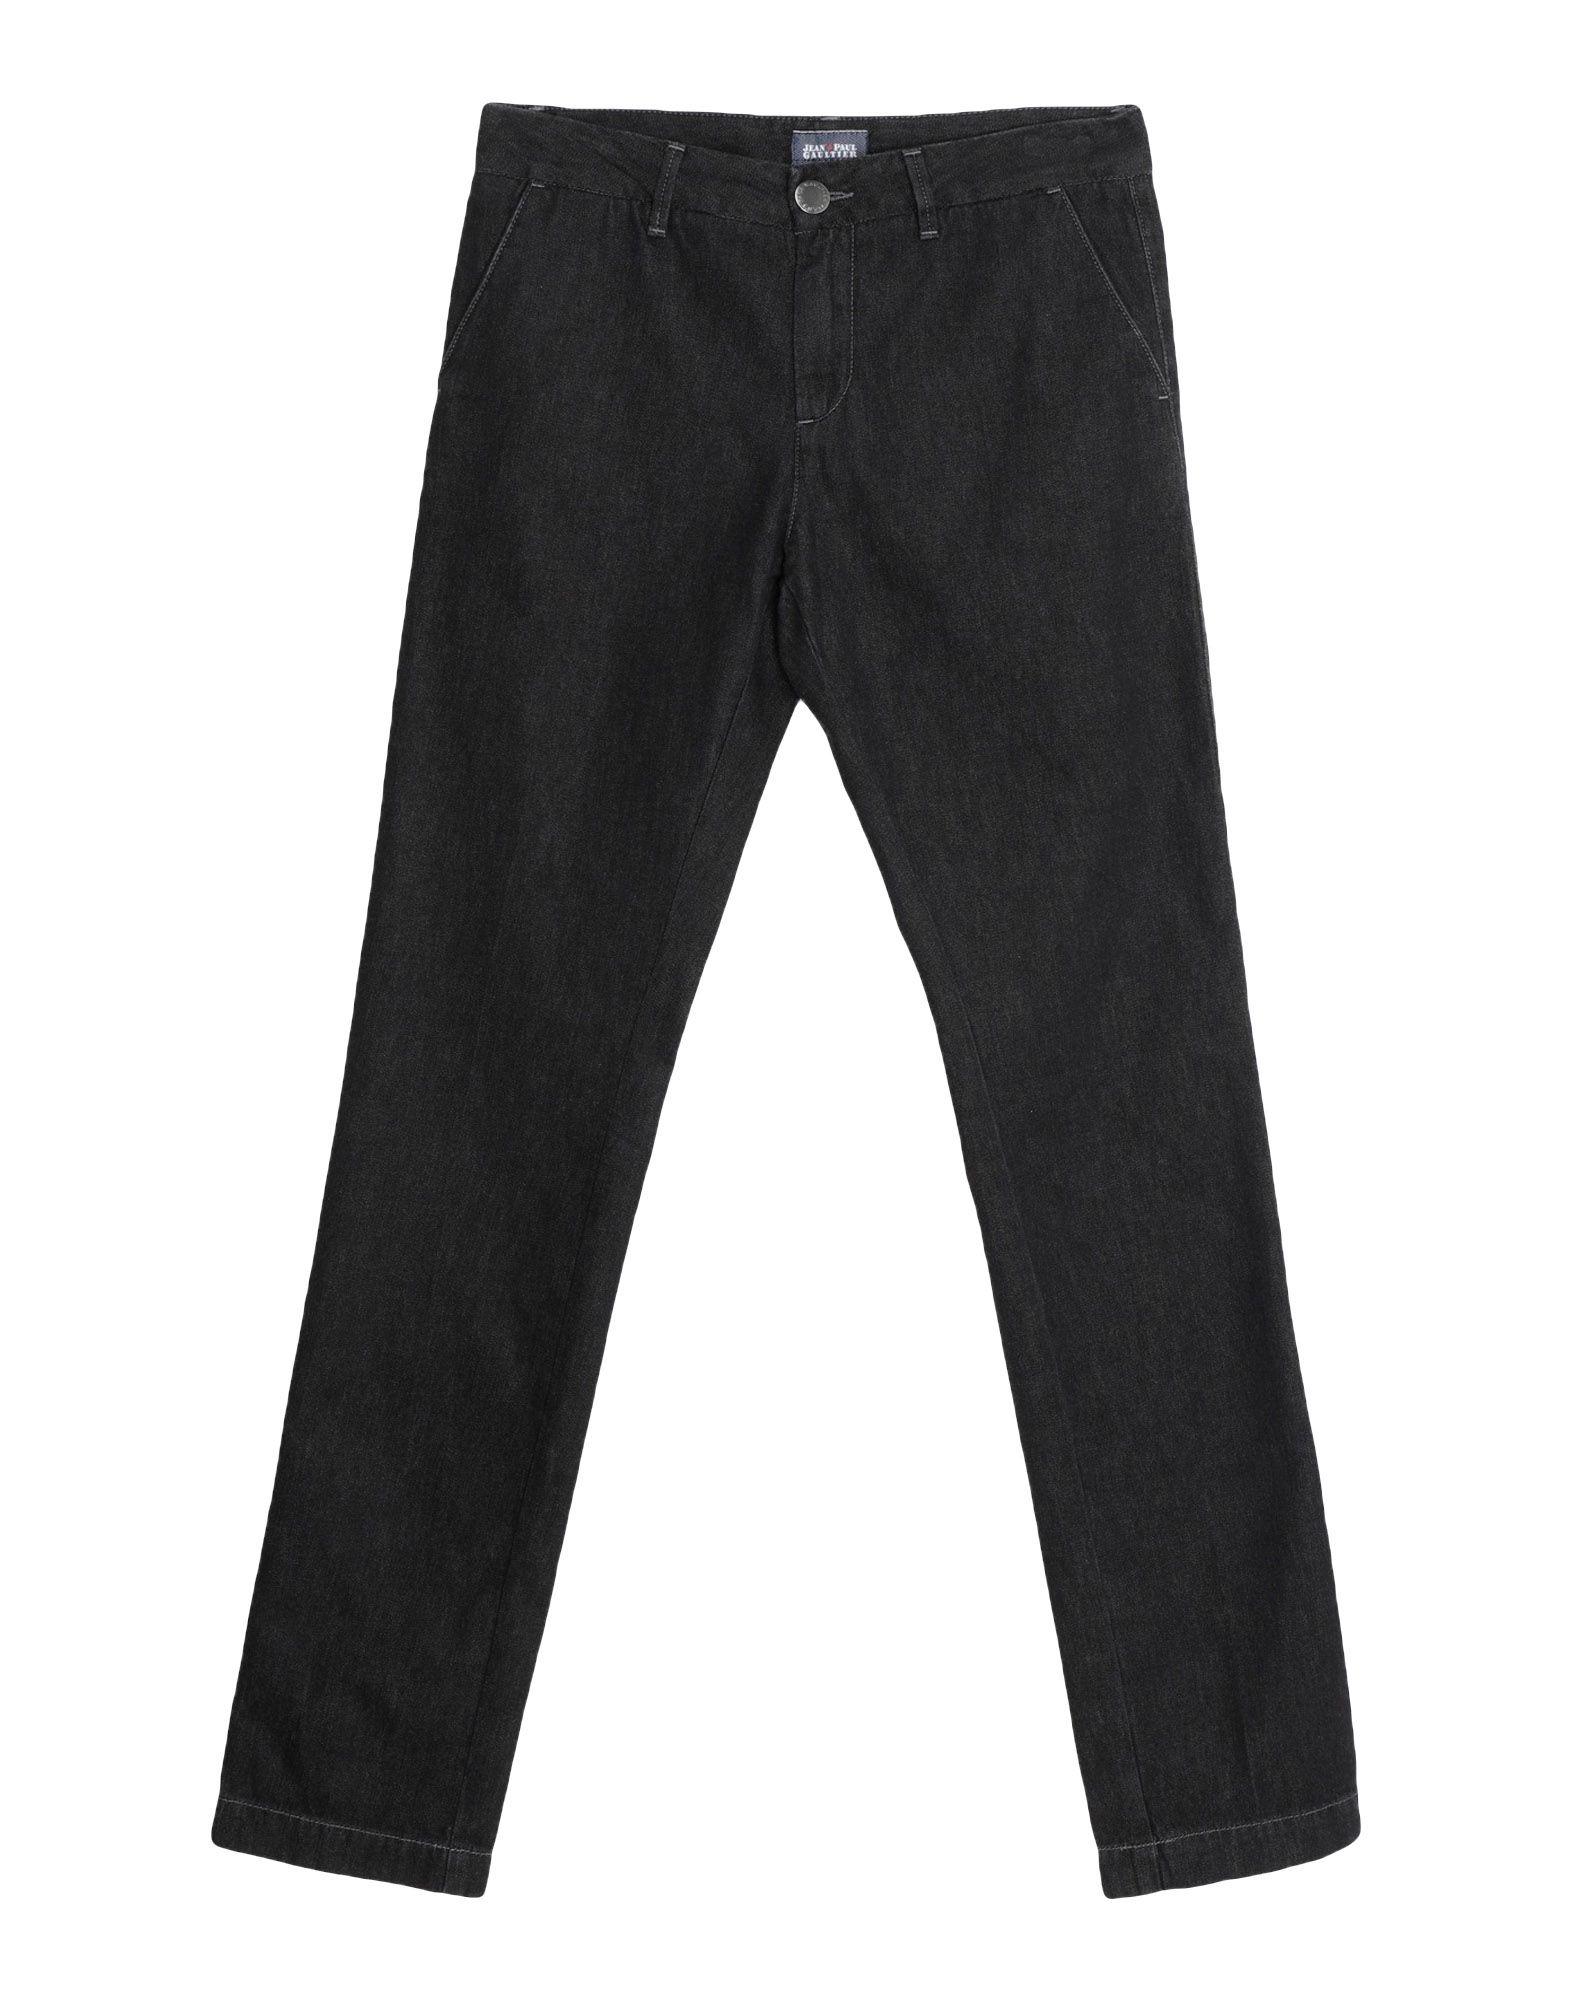 Pantaloni Jeans Jeans Jean's Paul Gaultier uomo - 42727062DH  Wir nehmen Kunden als unseren Gott